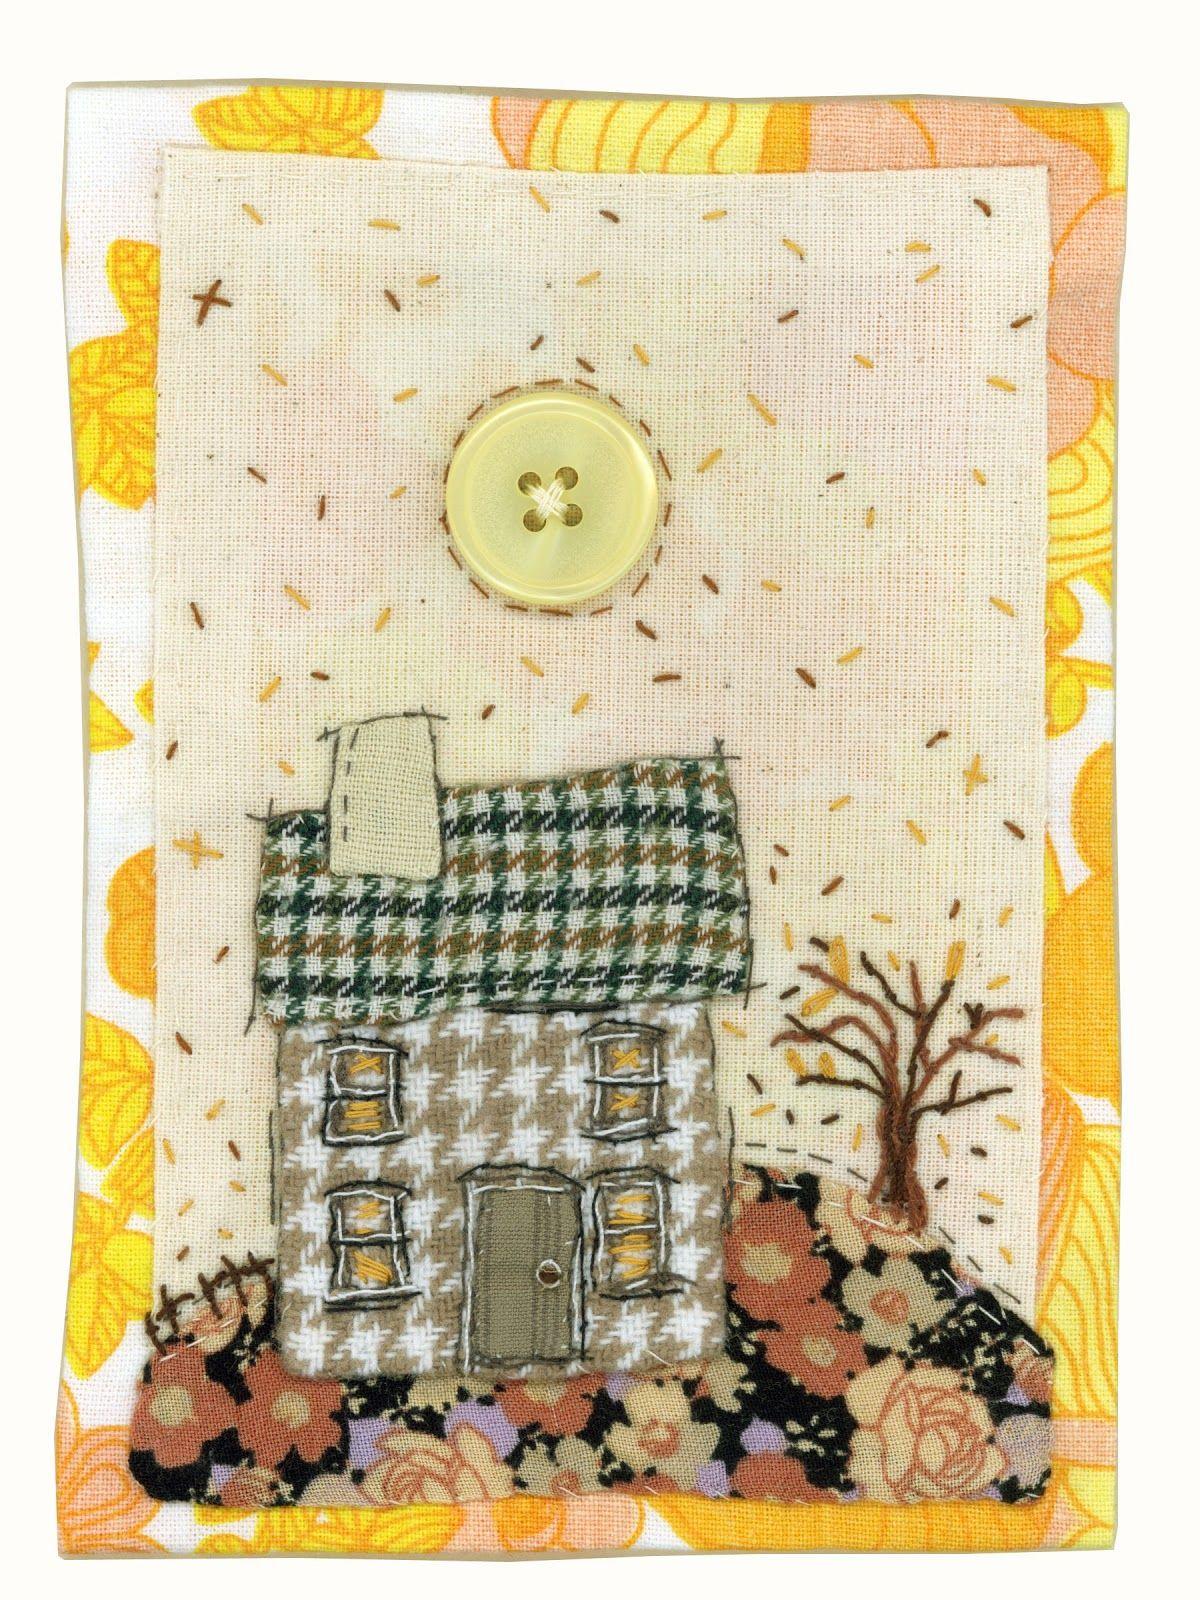 Autumn by Sharon Blackman